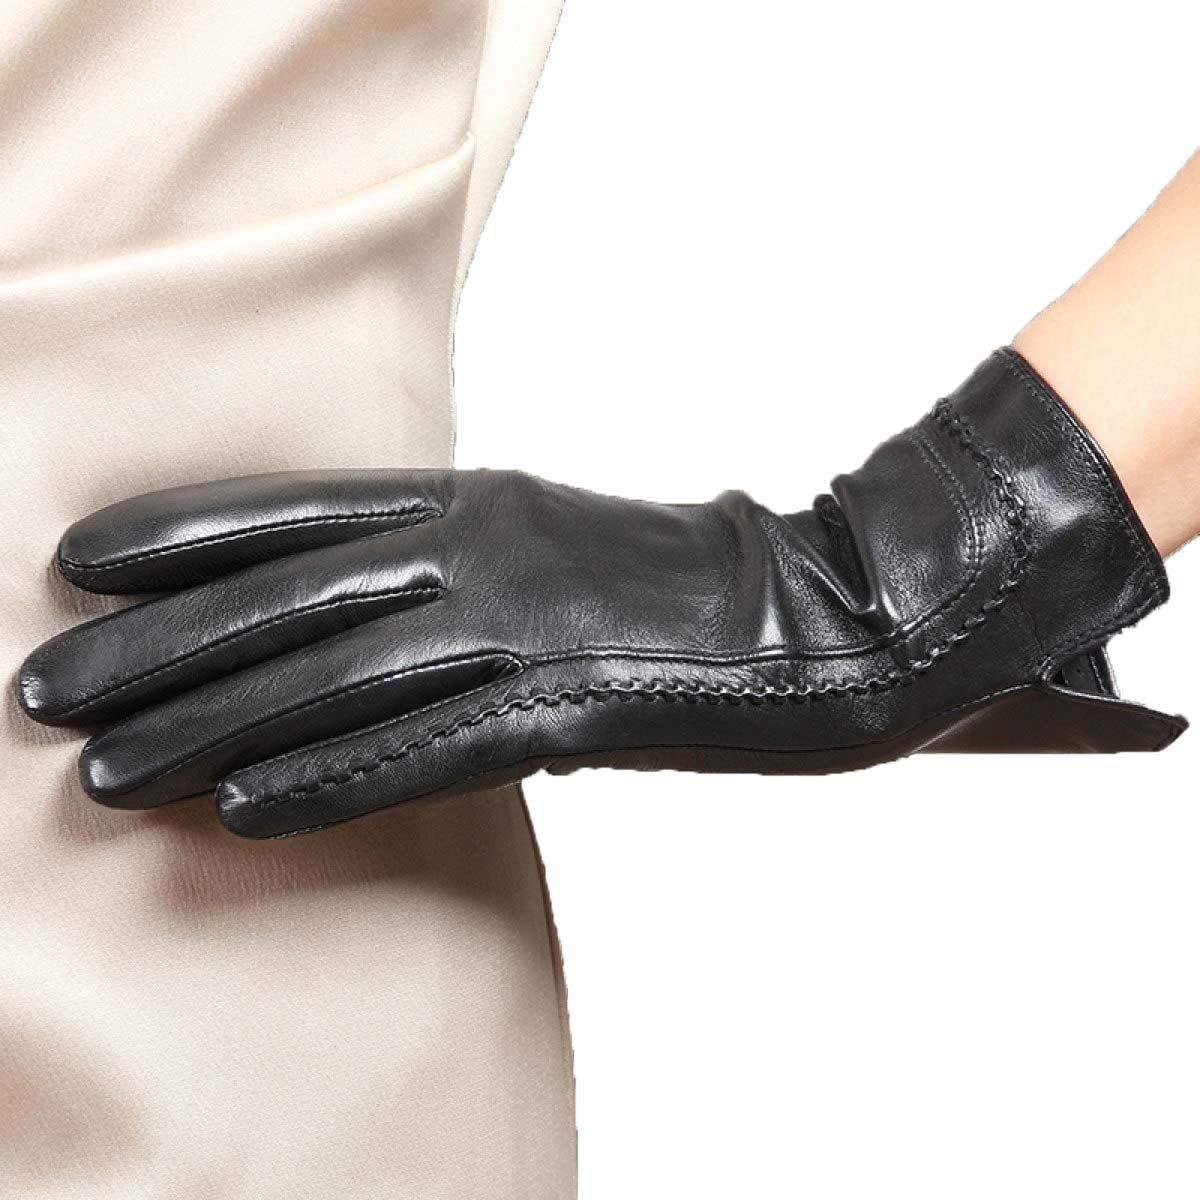 CWJ Women's Touchscreen Texting Leather Gloves Short Fashion Classic Super Warm Black,Black,Medium